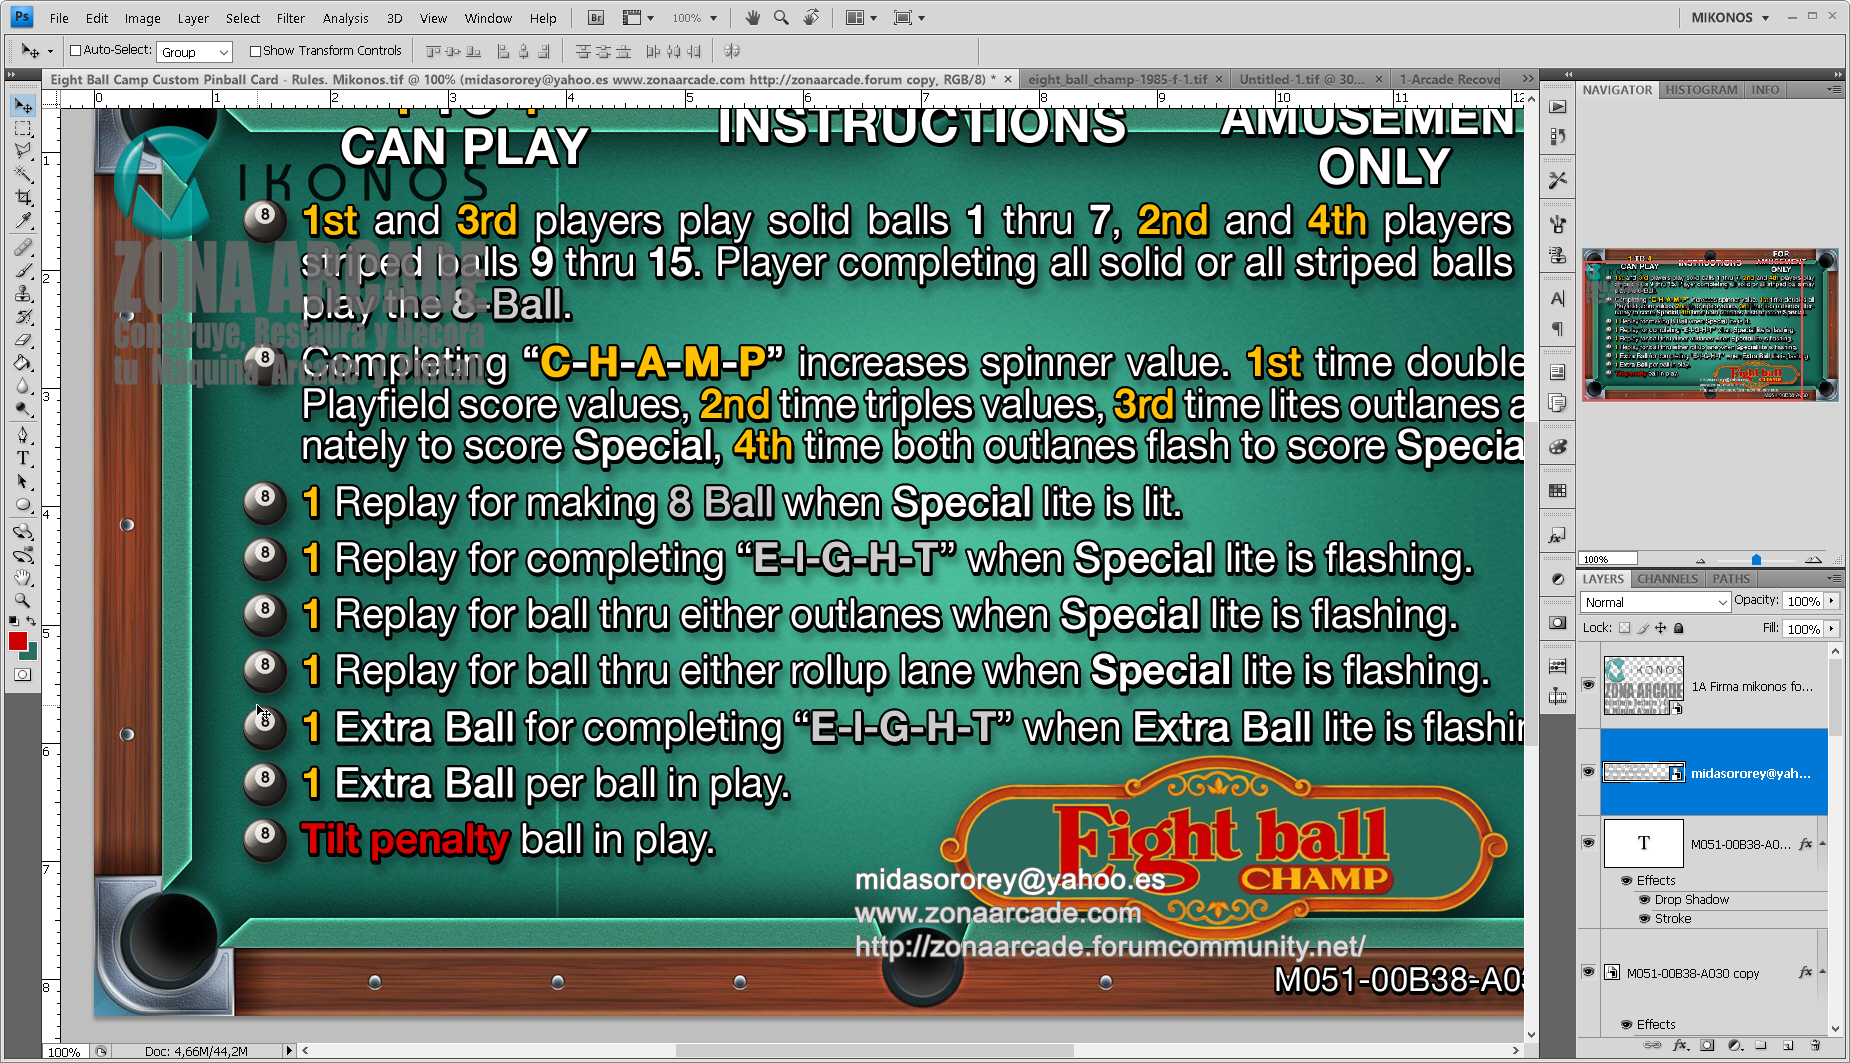 Eight Ball Champ Pinball Card Customized - Rules. Mikonos2